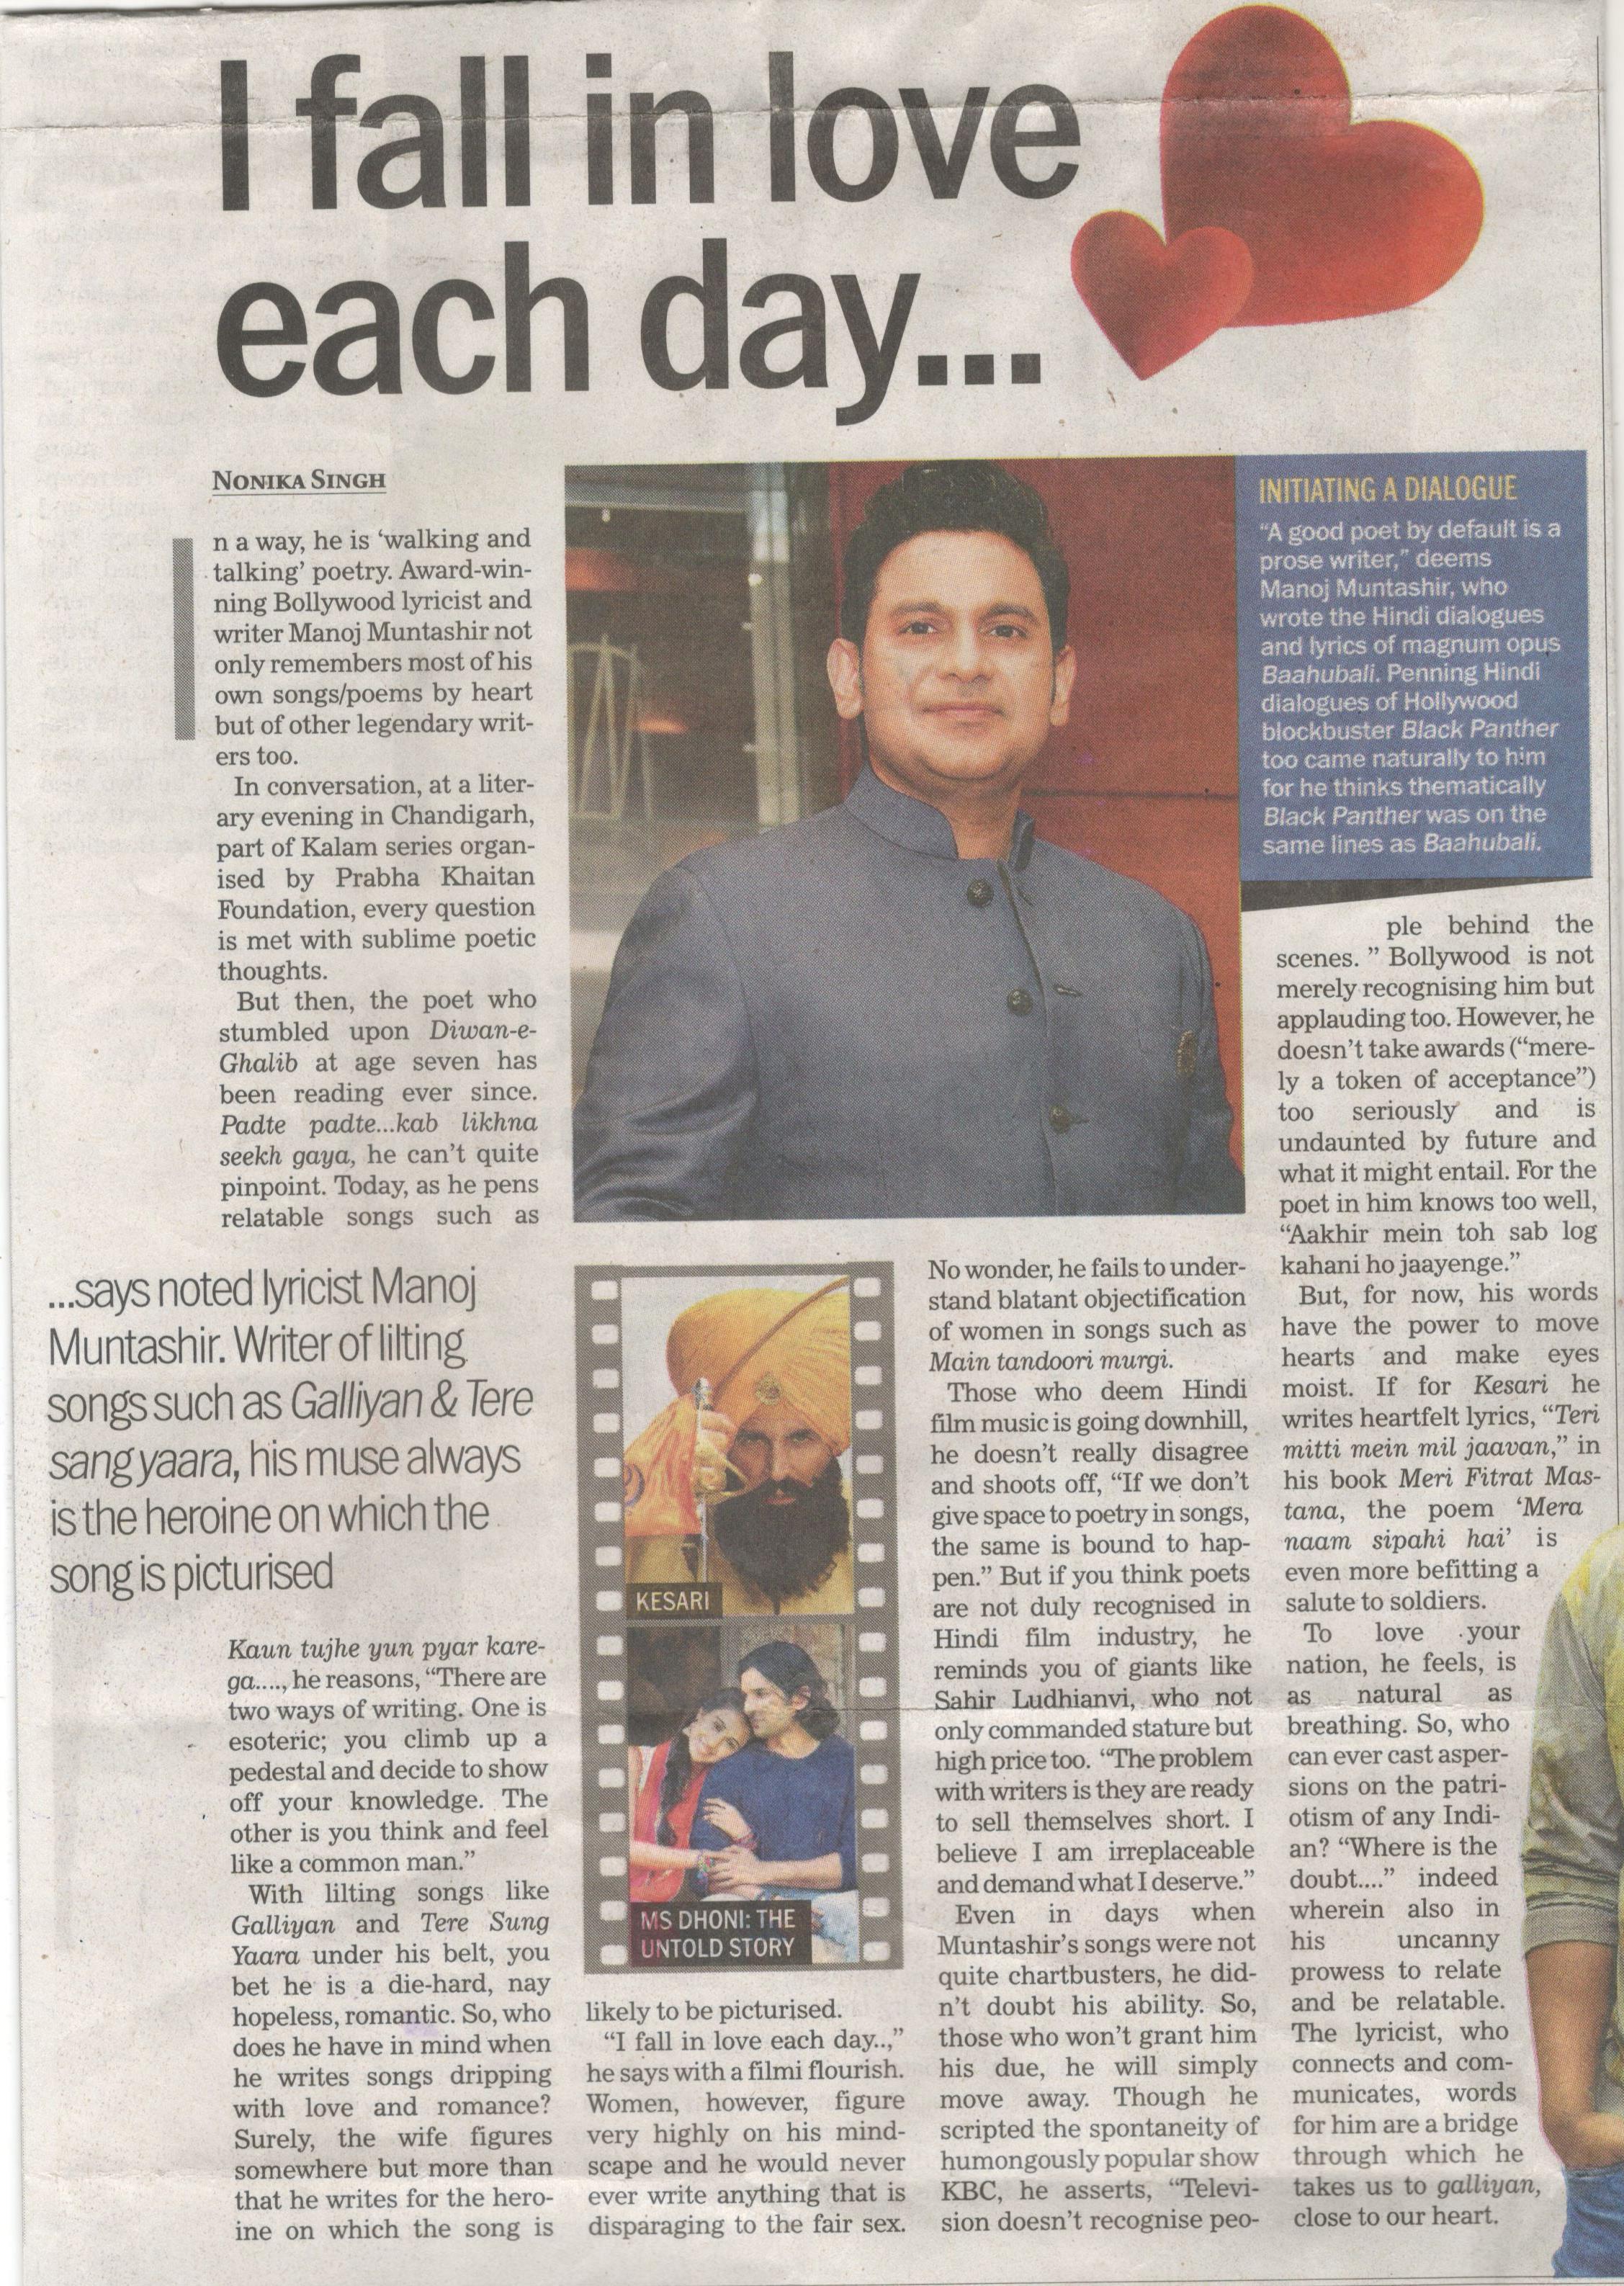 Kalam-Chandigarh-Manoj-Muntashir-Tribune-LifeStyle